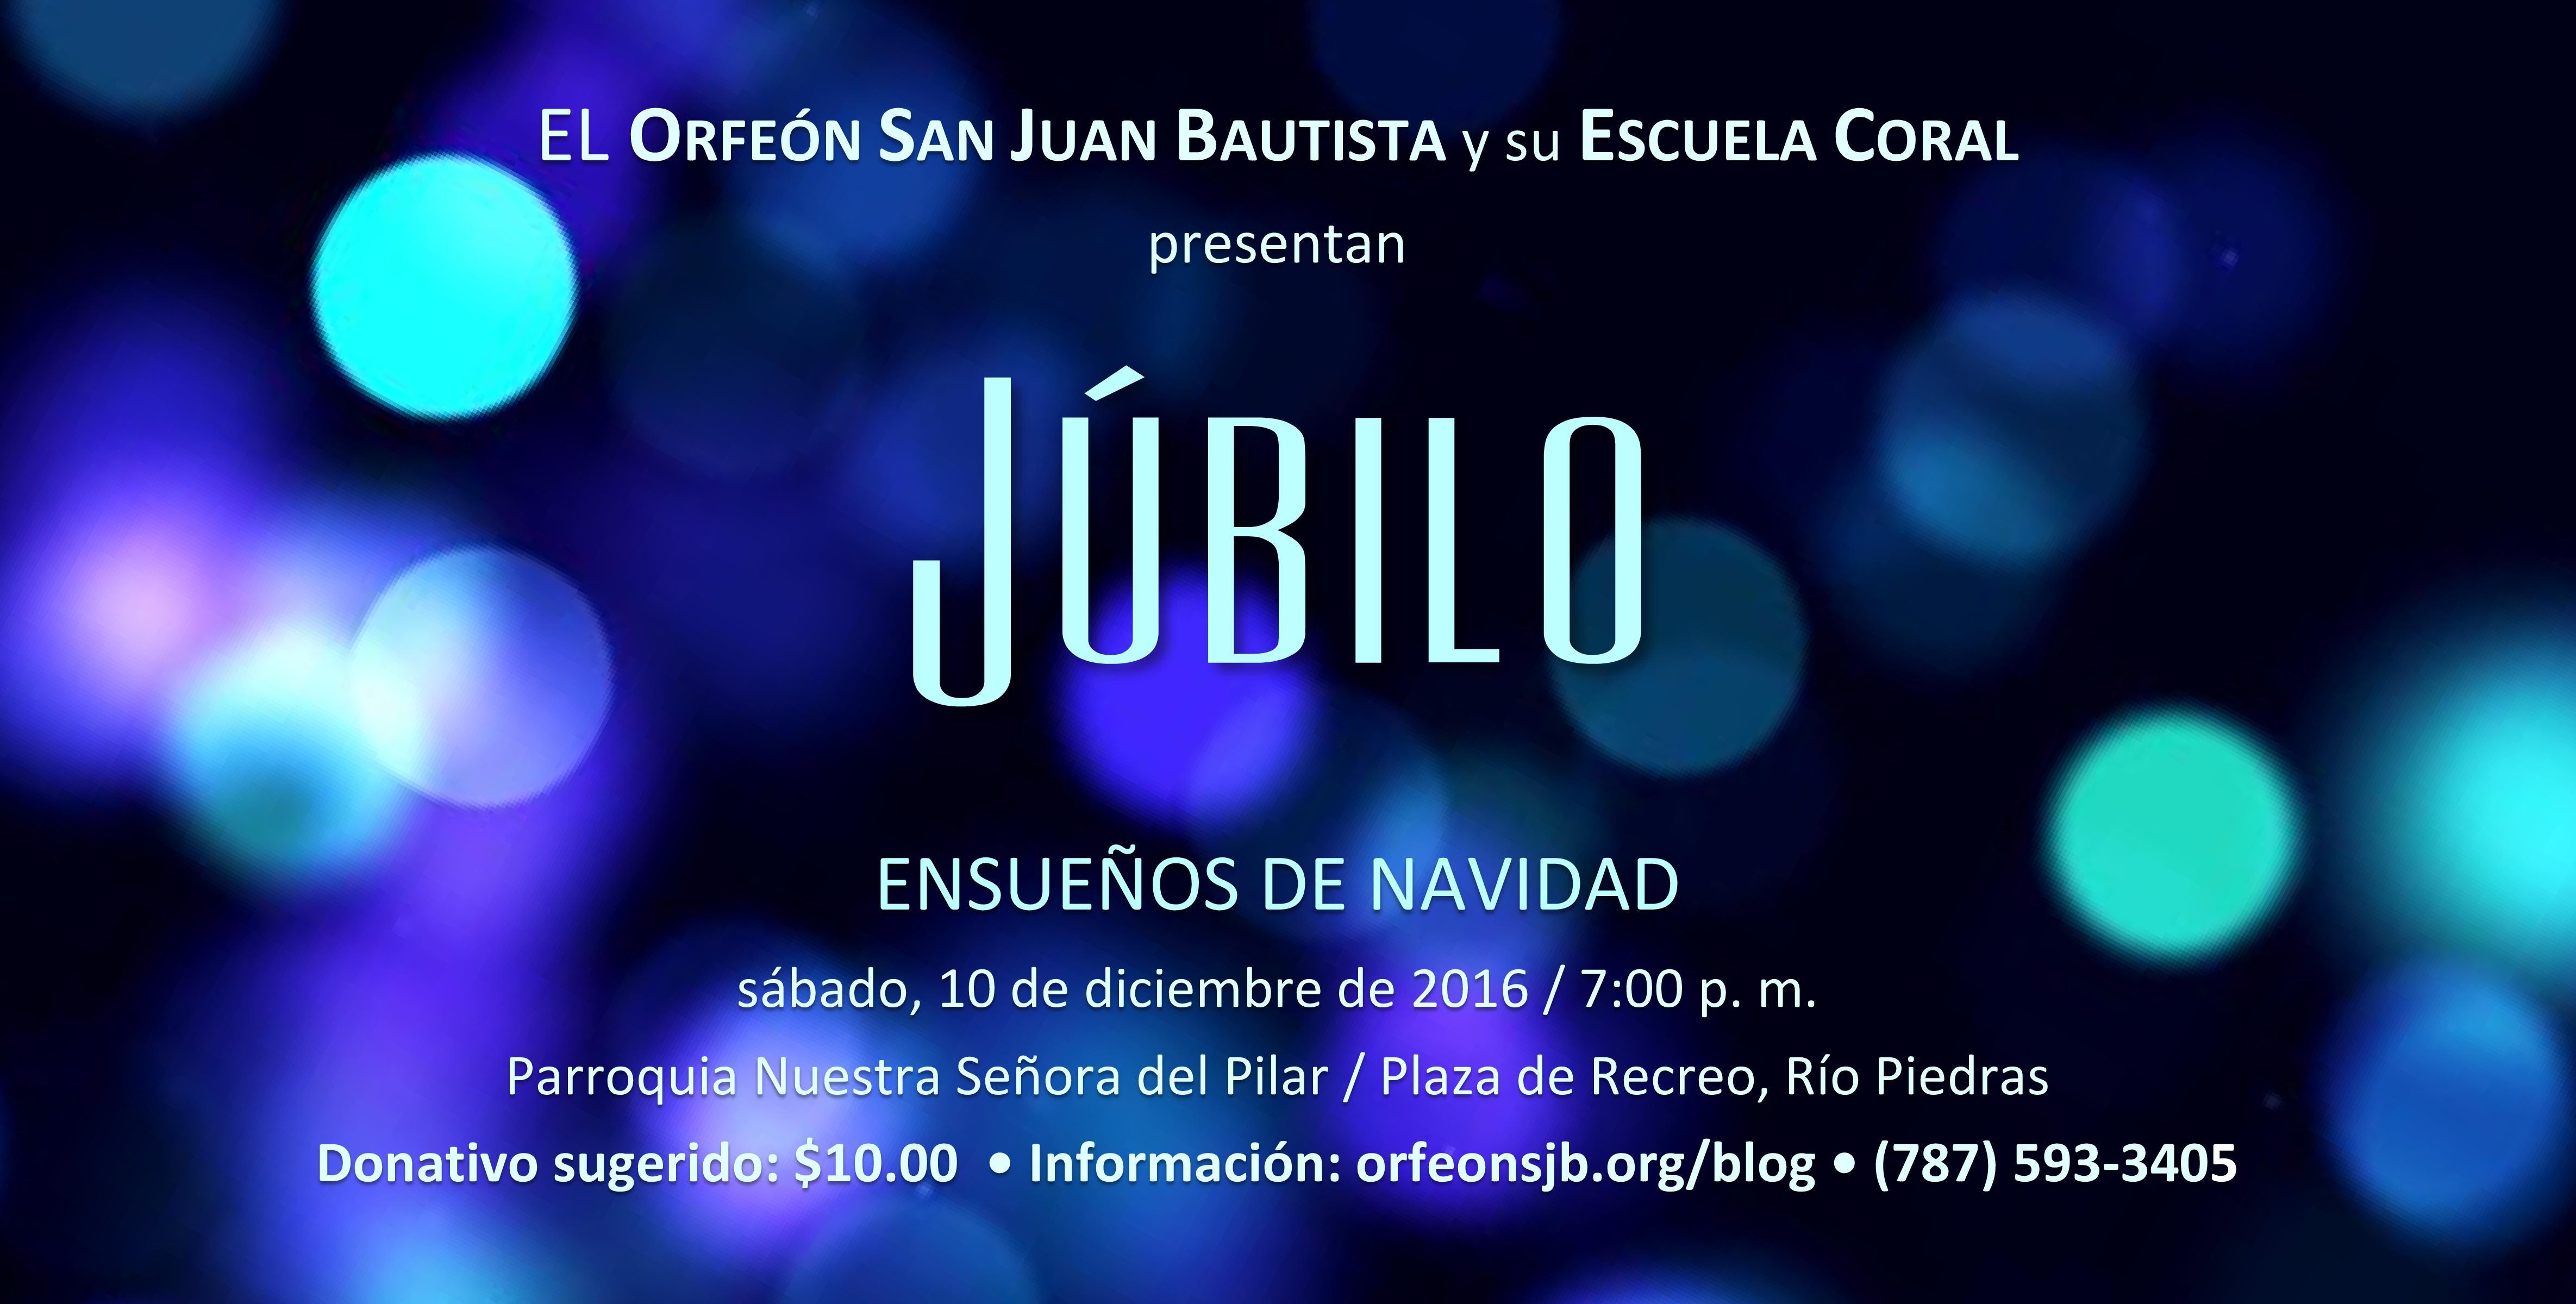 jubilo-banner-fan-page-page-001